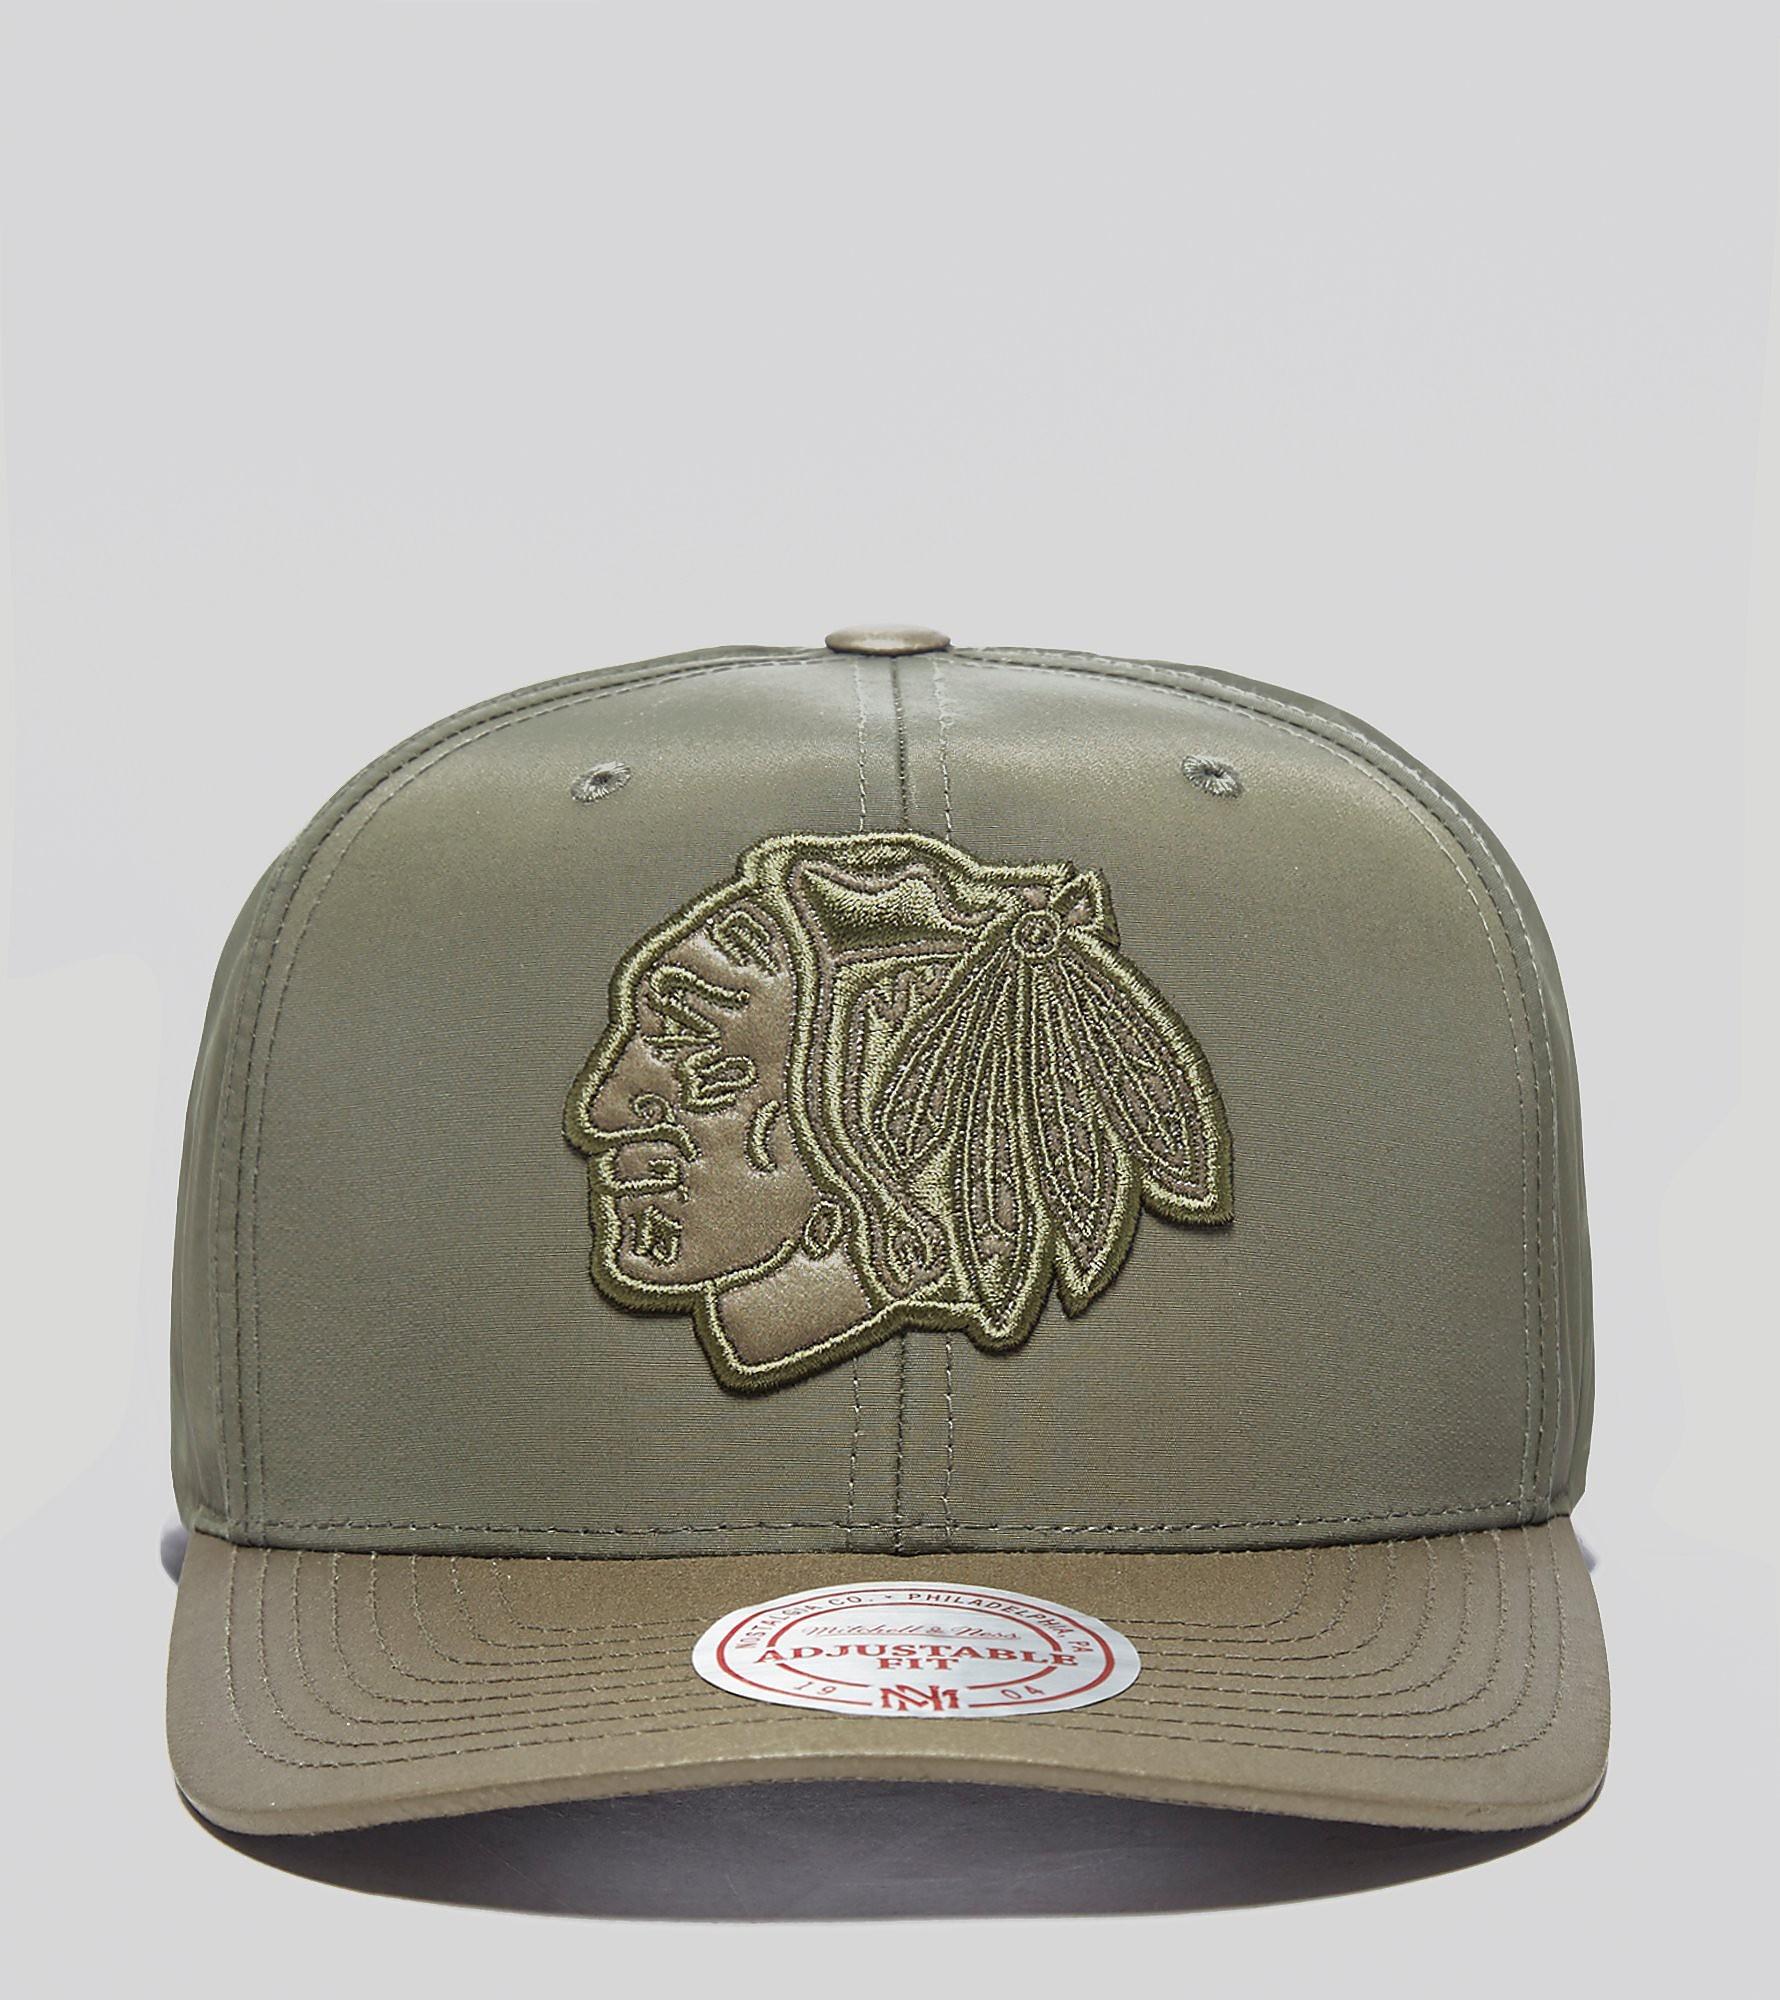 Mitchell & Ness Blackhawks Curved Peak Cap - size? Exclusive